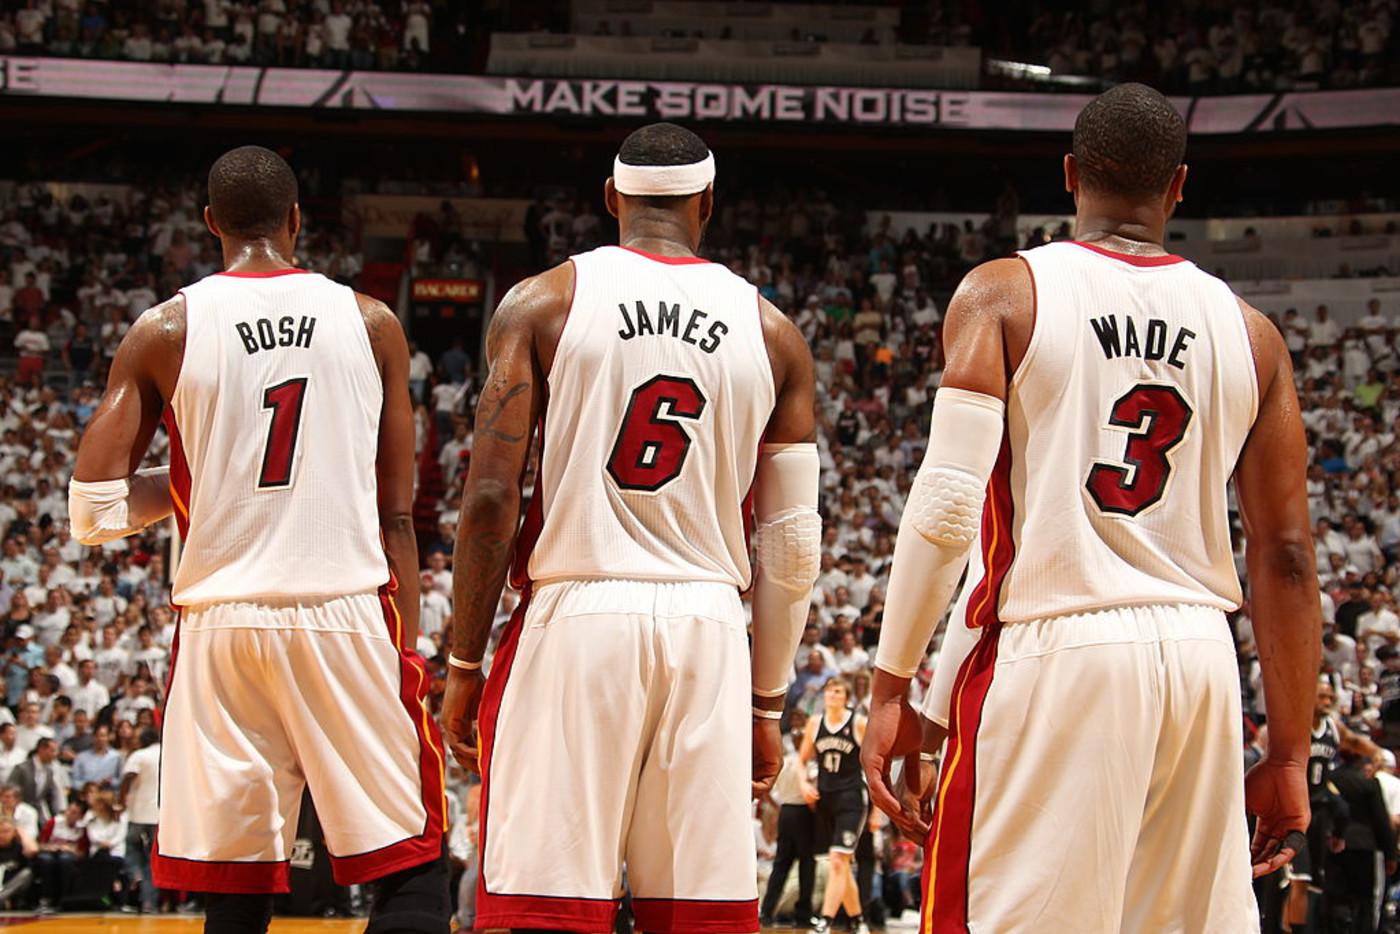 Chris Bosh LeBron James Dwyane Wade Miami Heat 2014